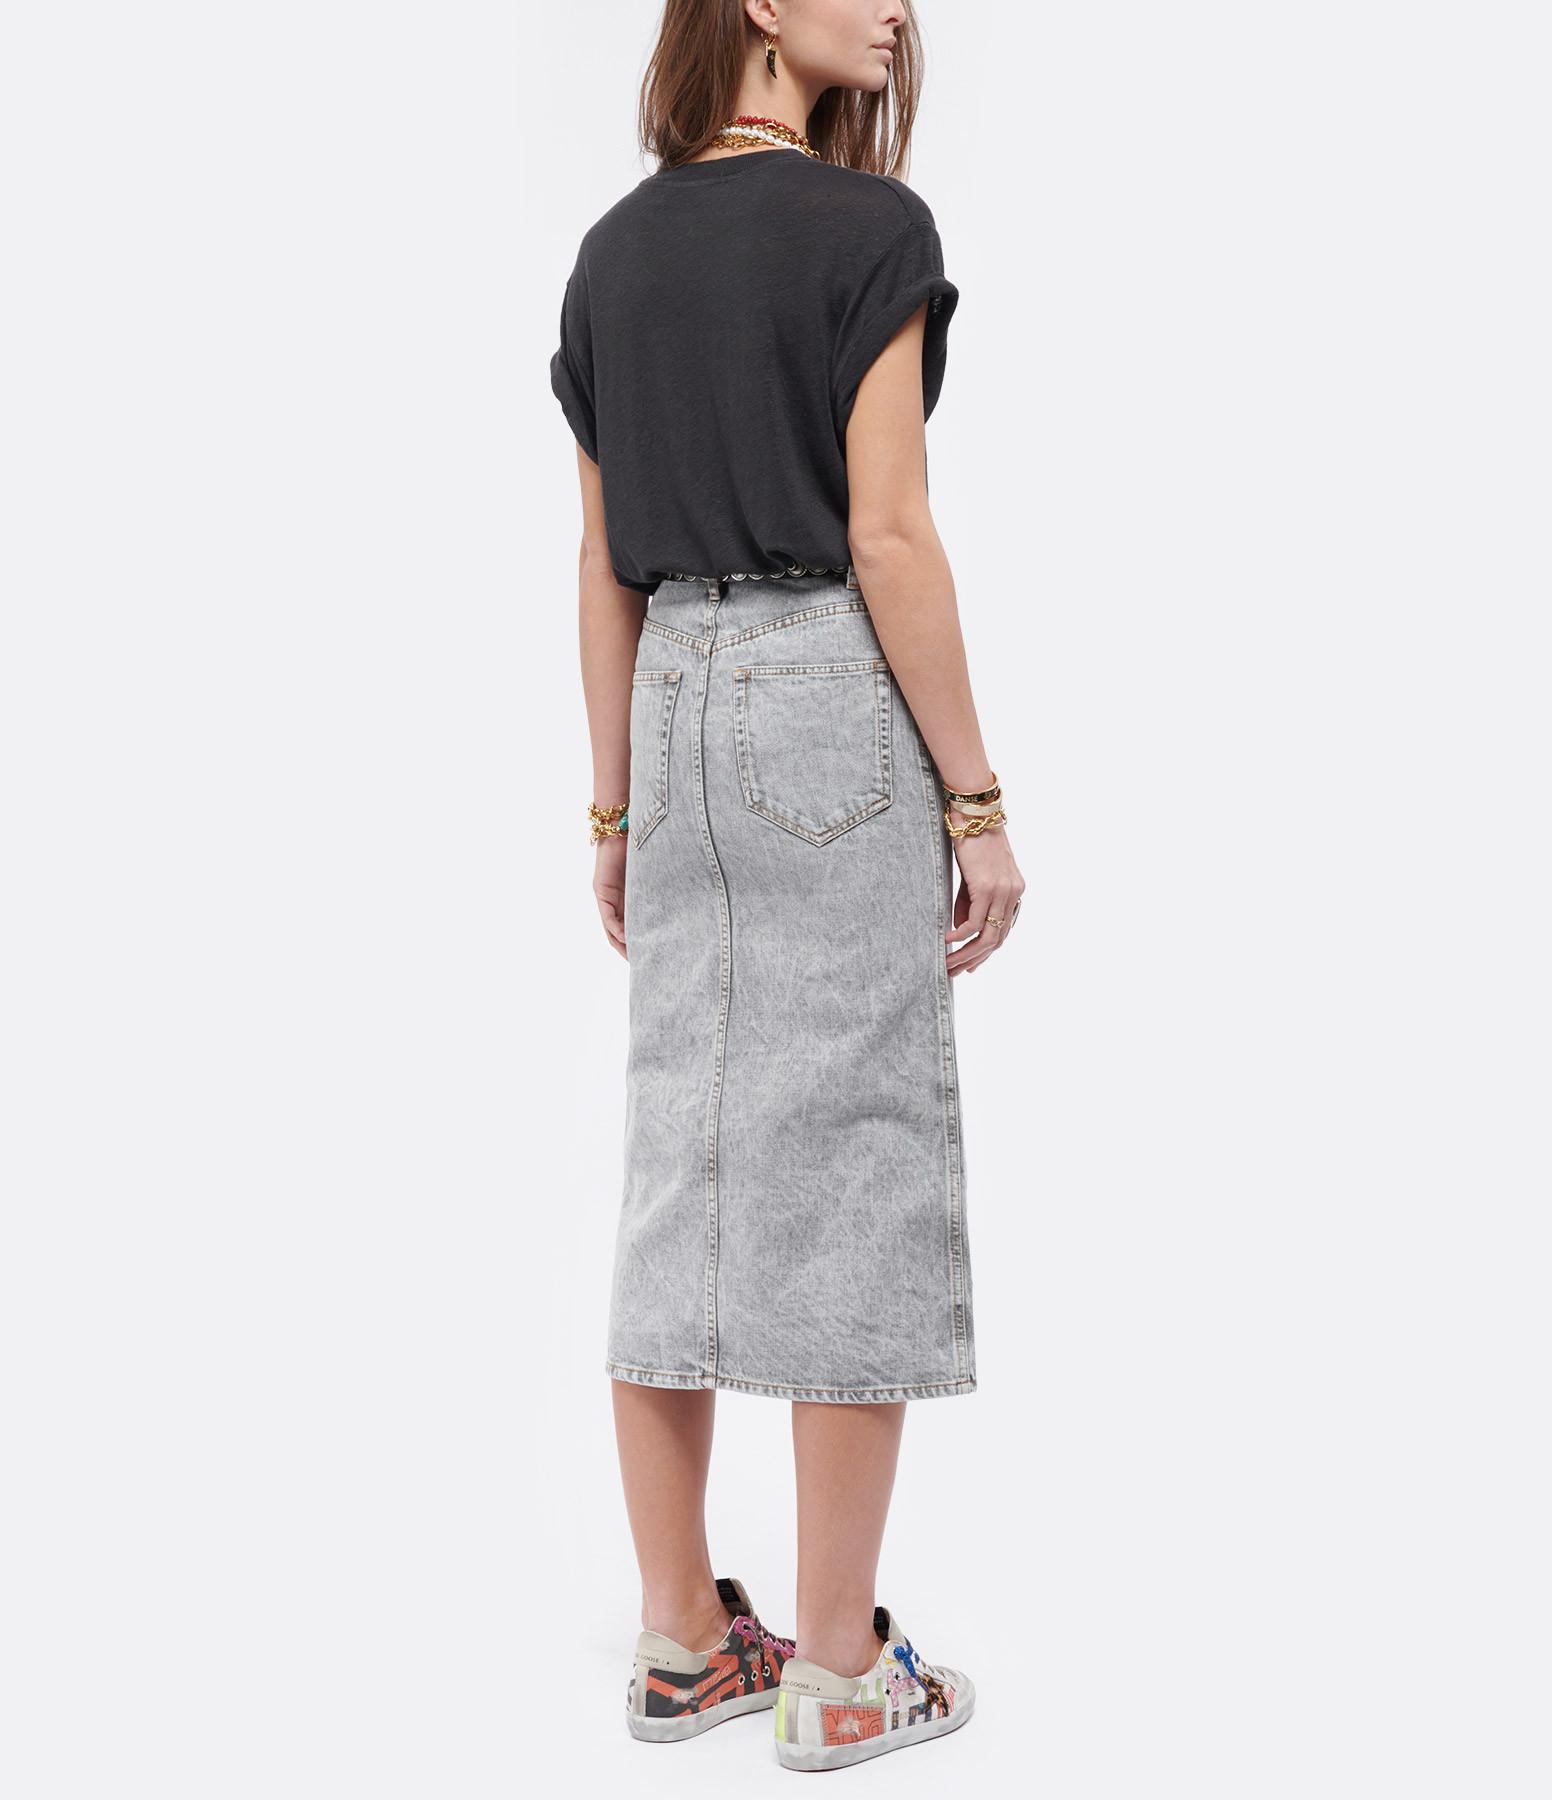 IRO - Tee-shirt Sunshin Lin Noir